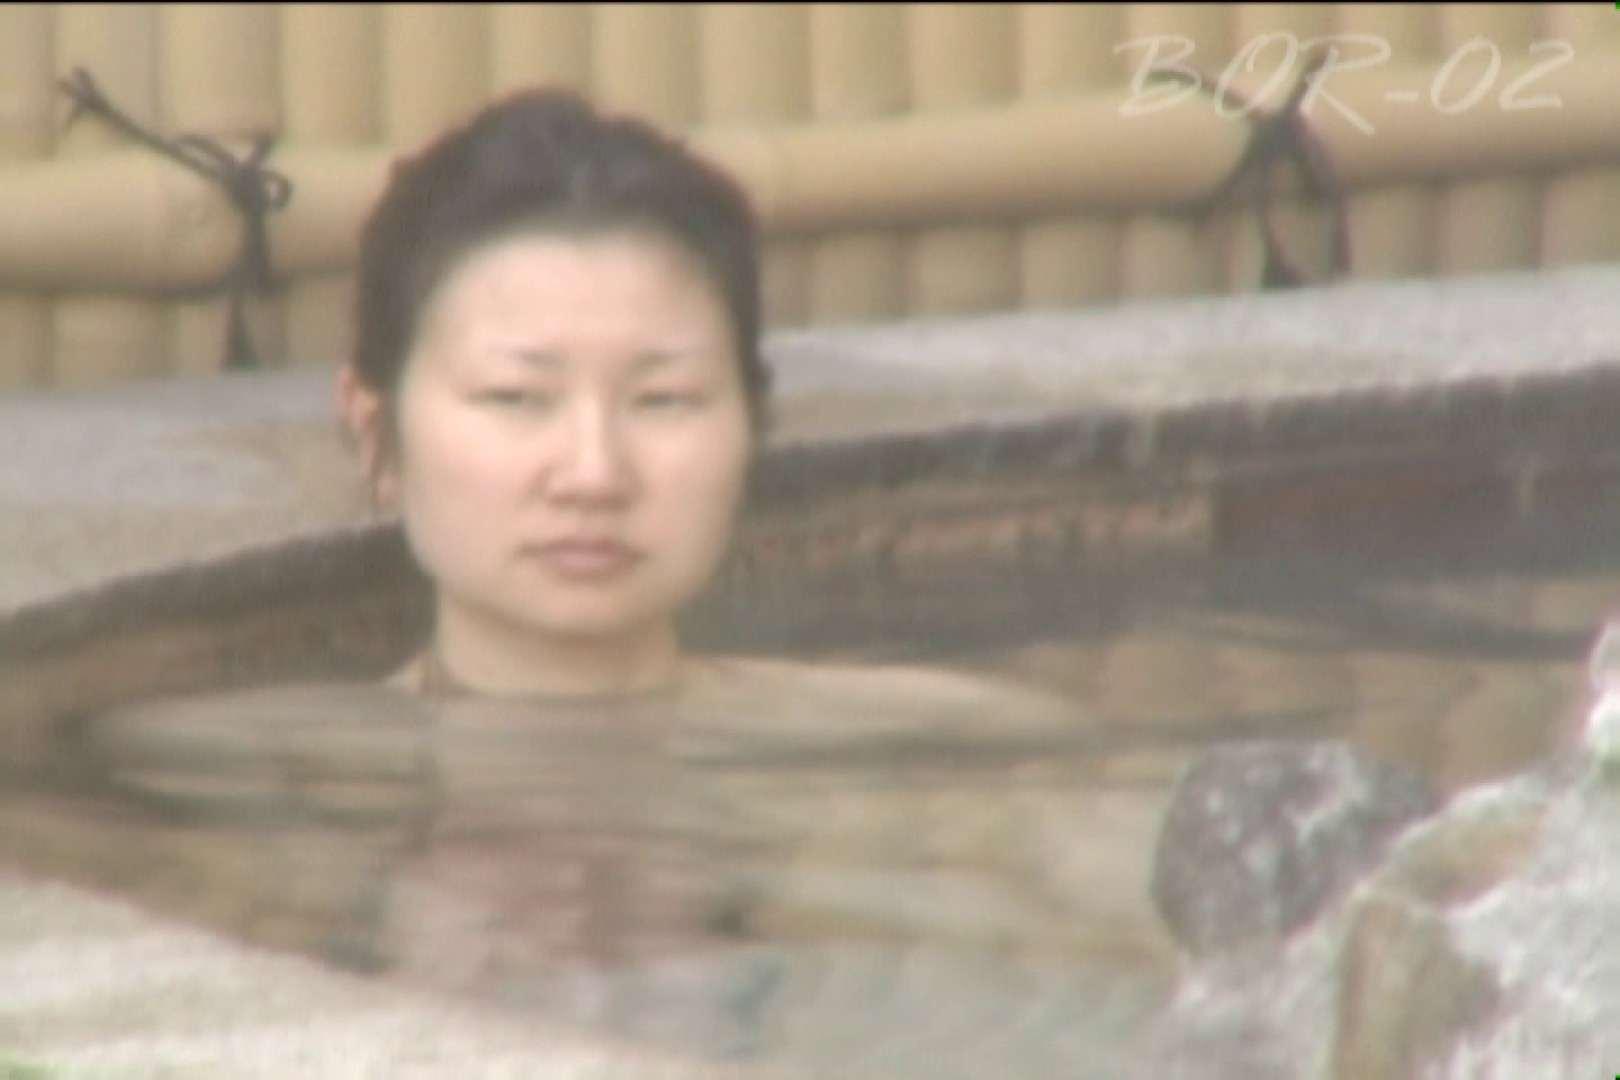 Aquaな露天風呂Vol.476 盗撮師作品 オマンコ無修正動画無料 85pic 17